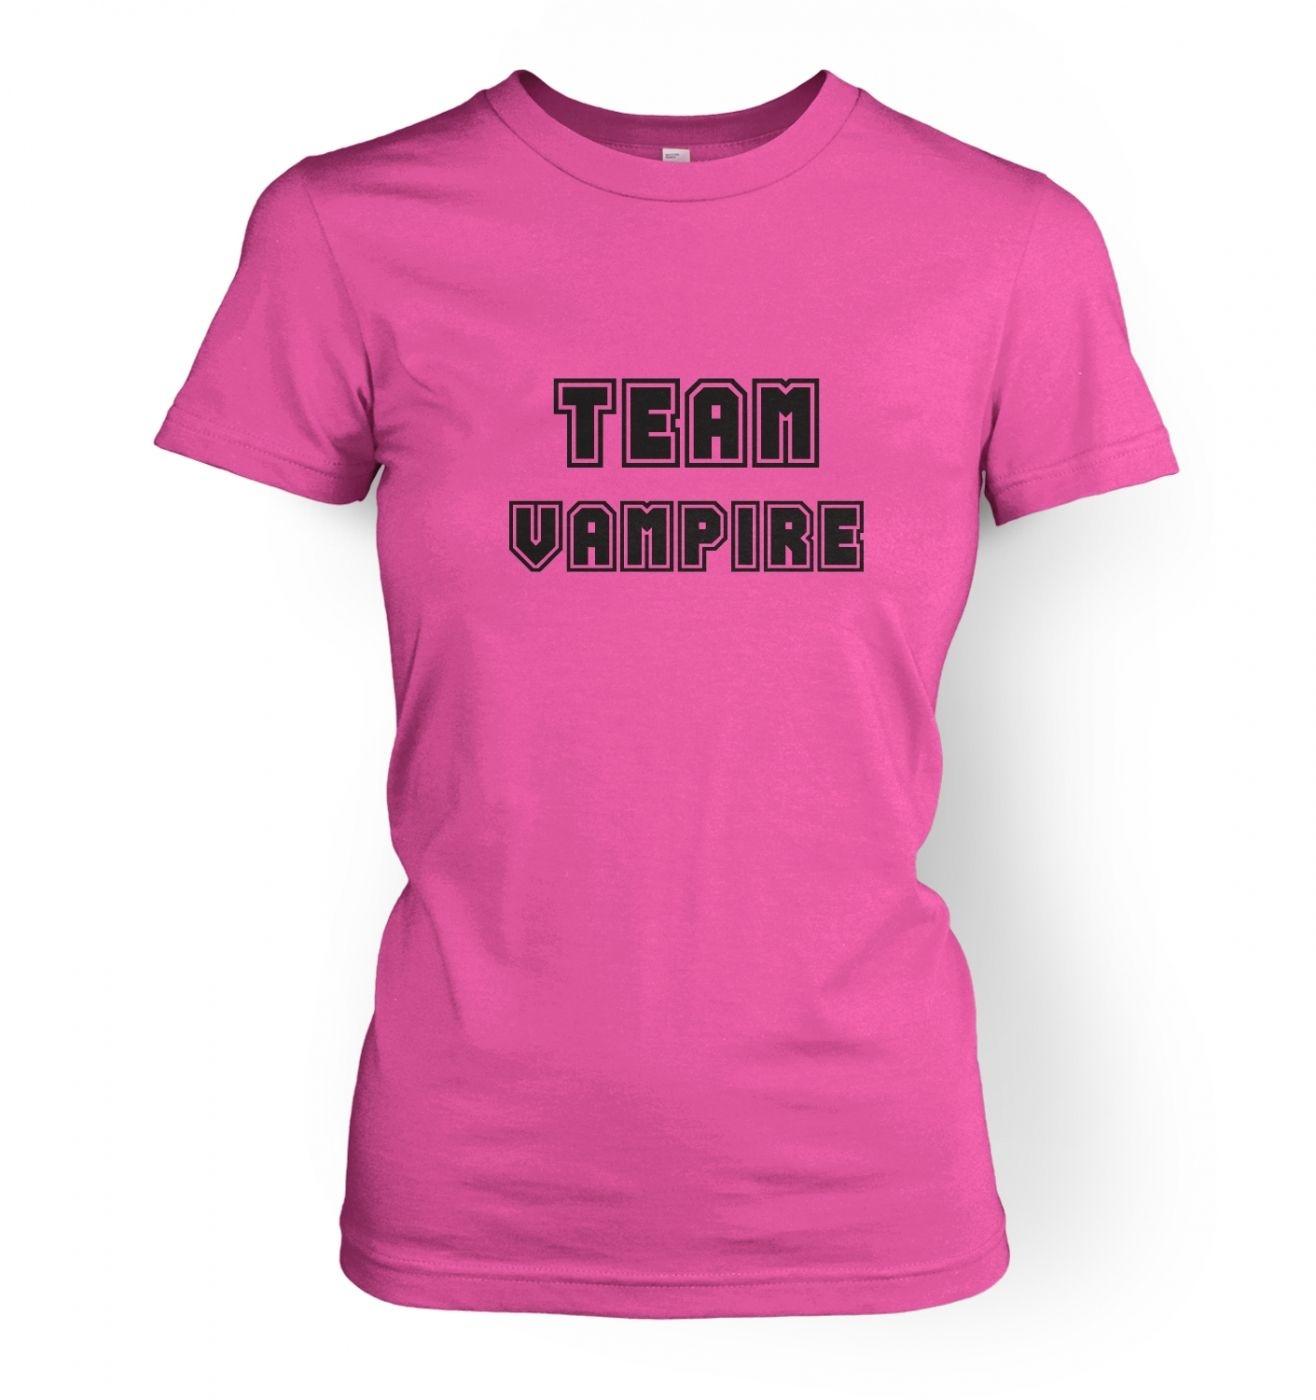 Varsity Style Team Vampire Women's t-shirt